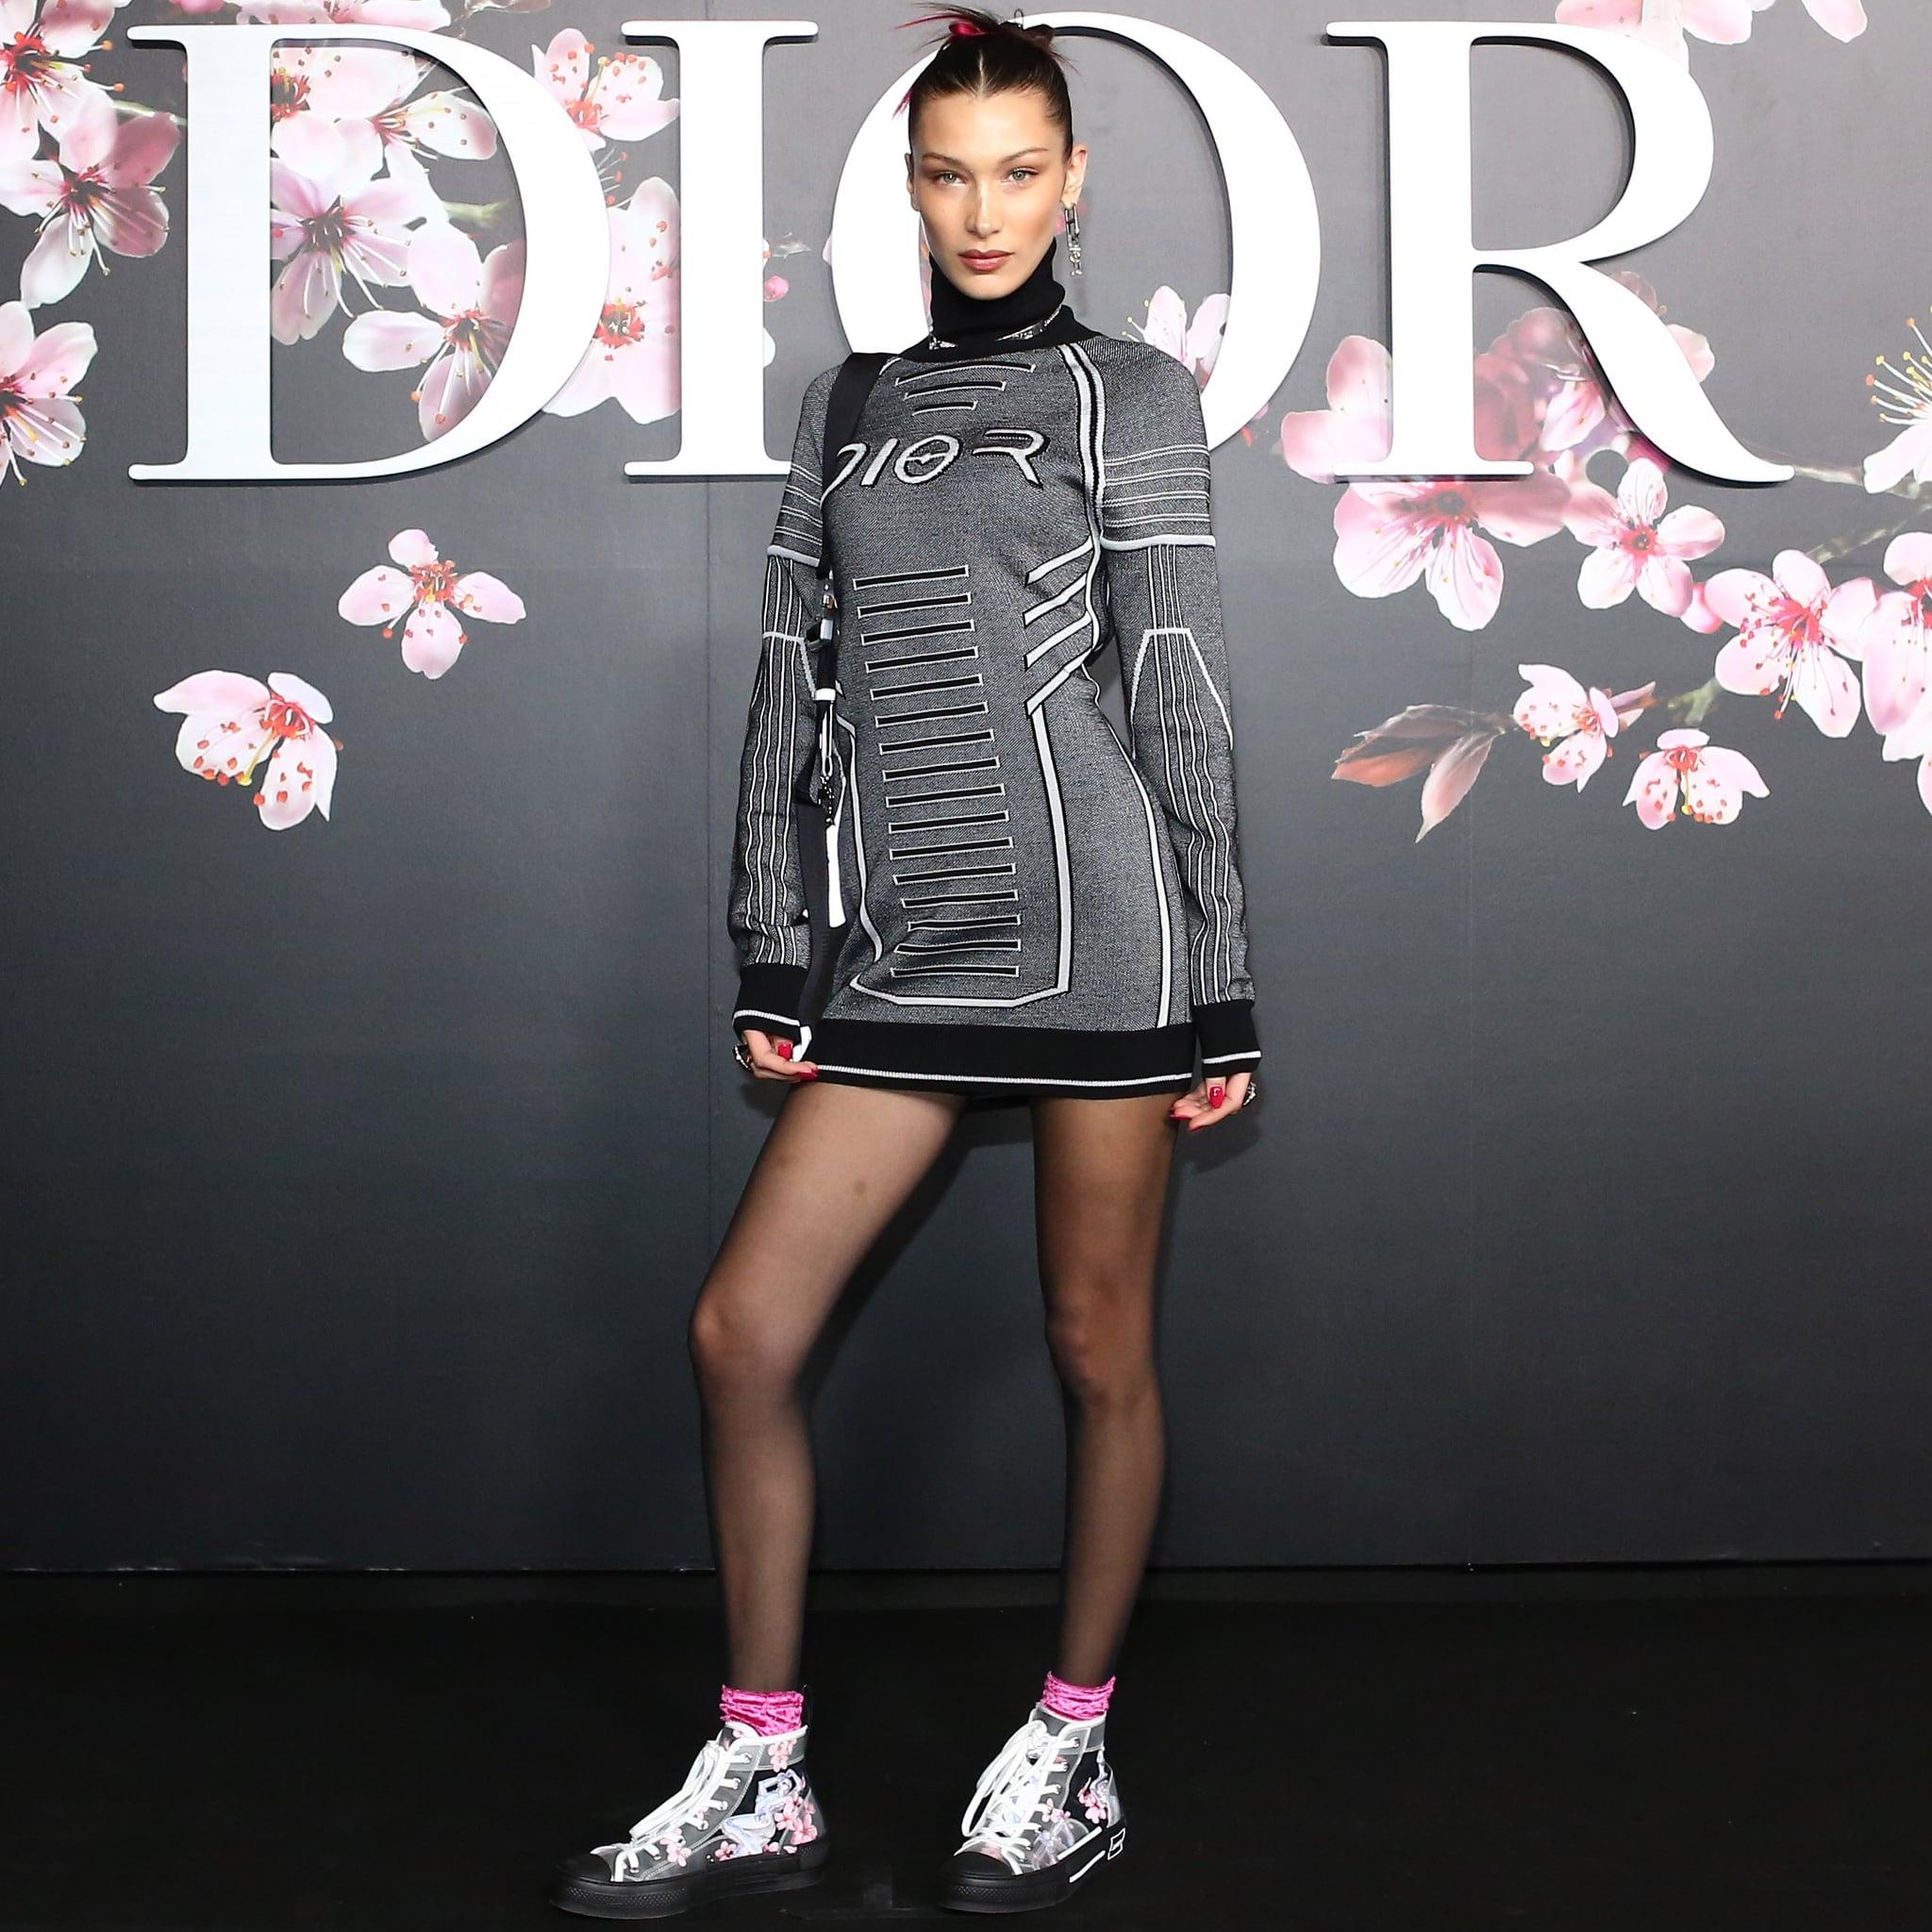 Bella Hadid Flower Sneakers at Dior